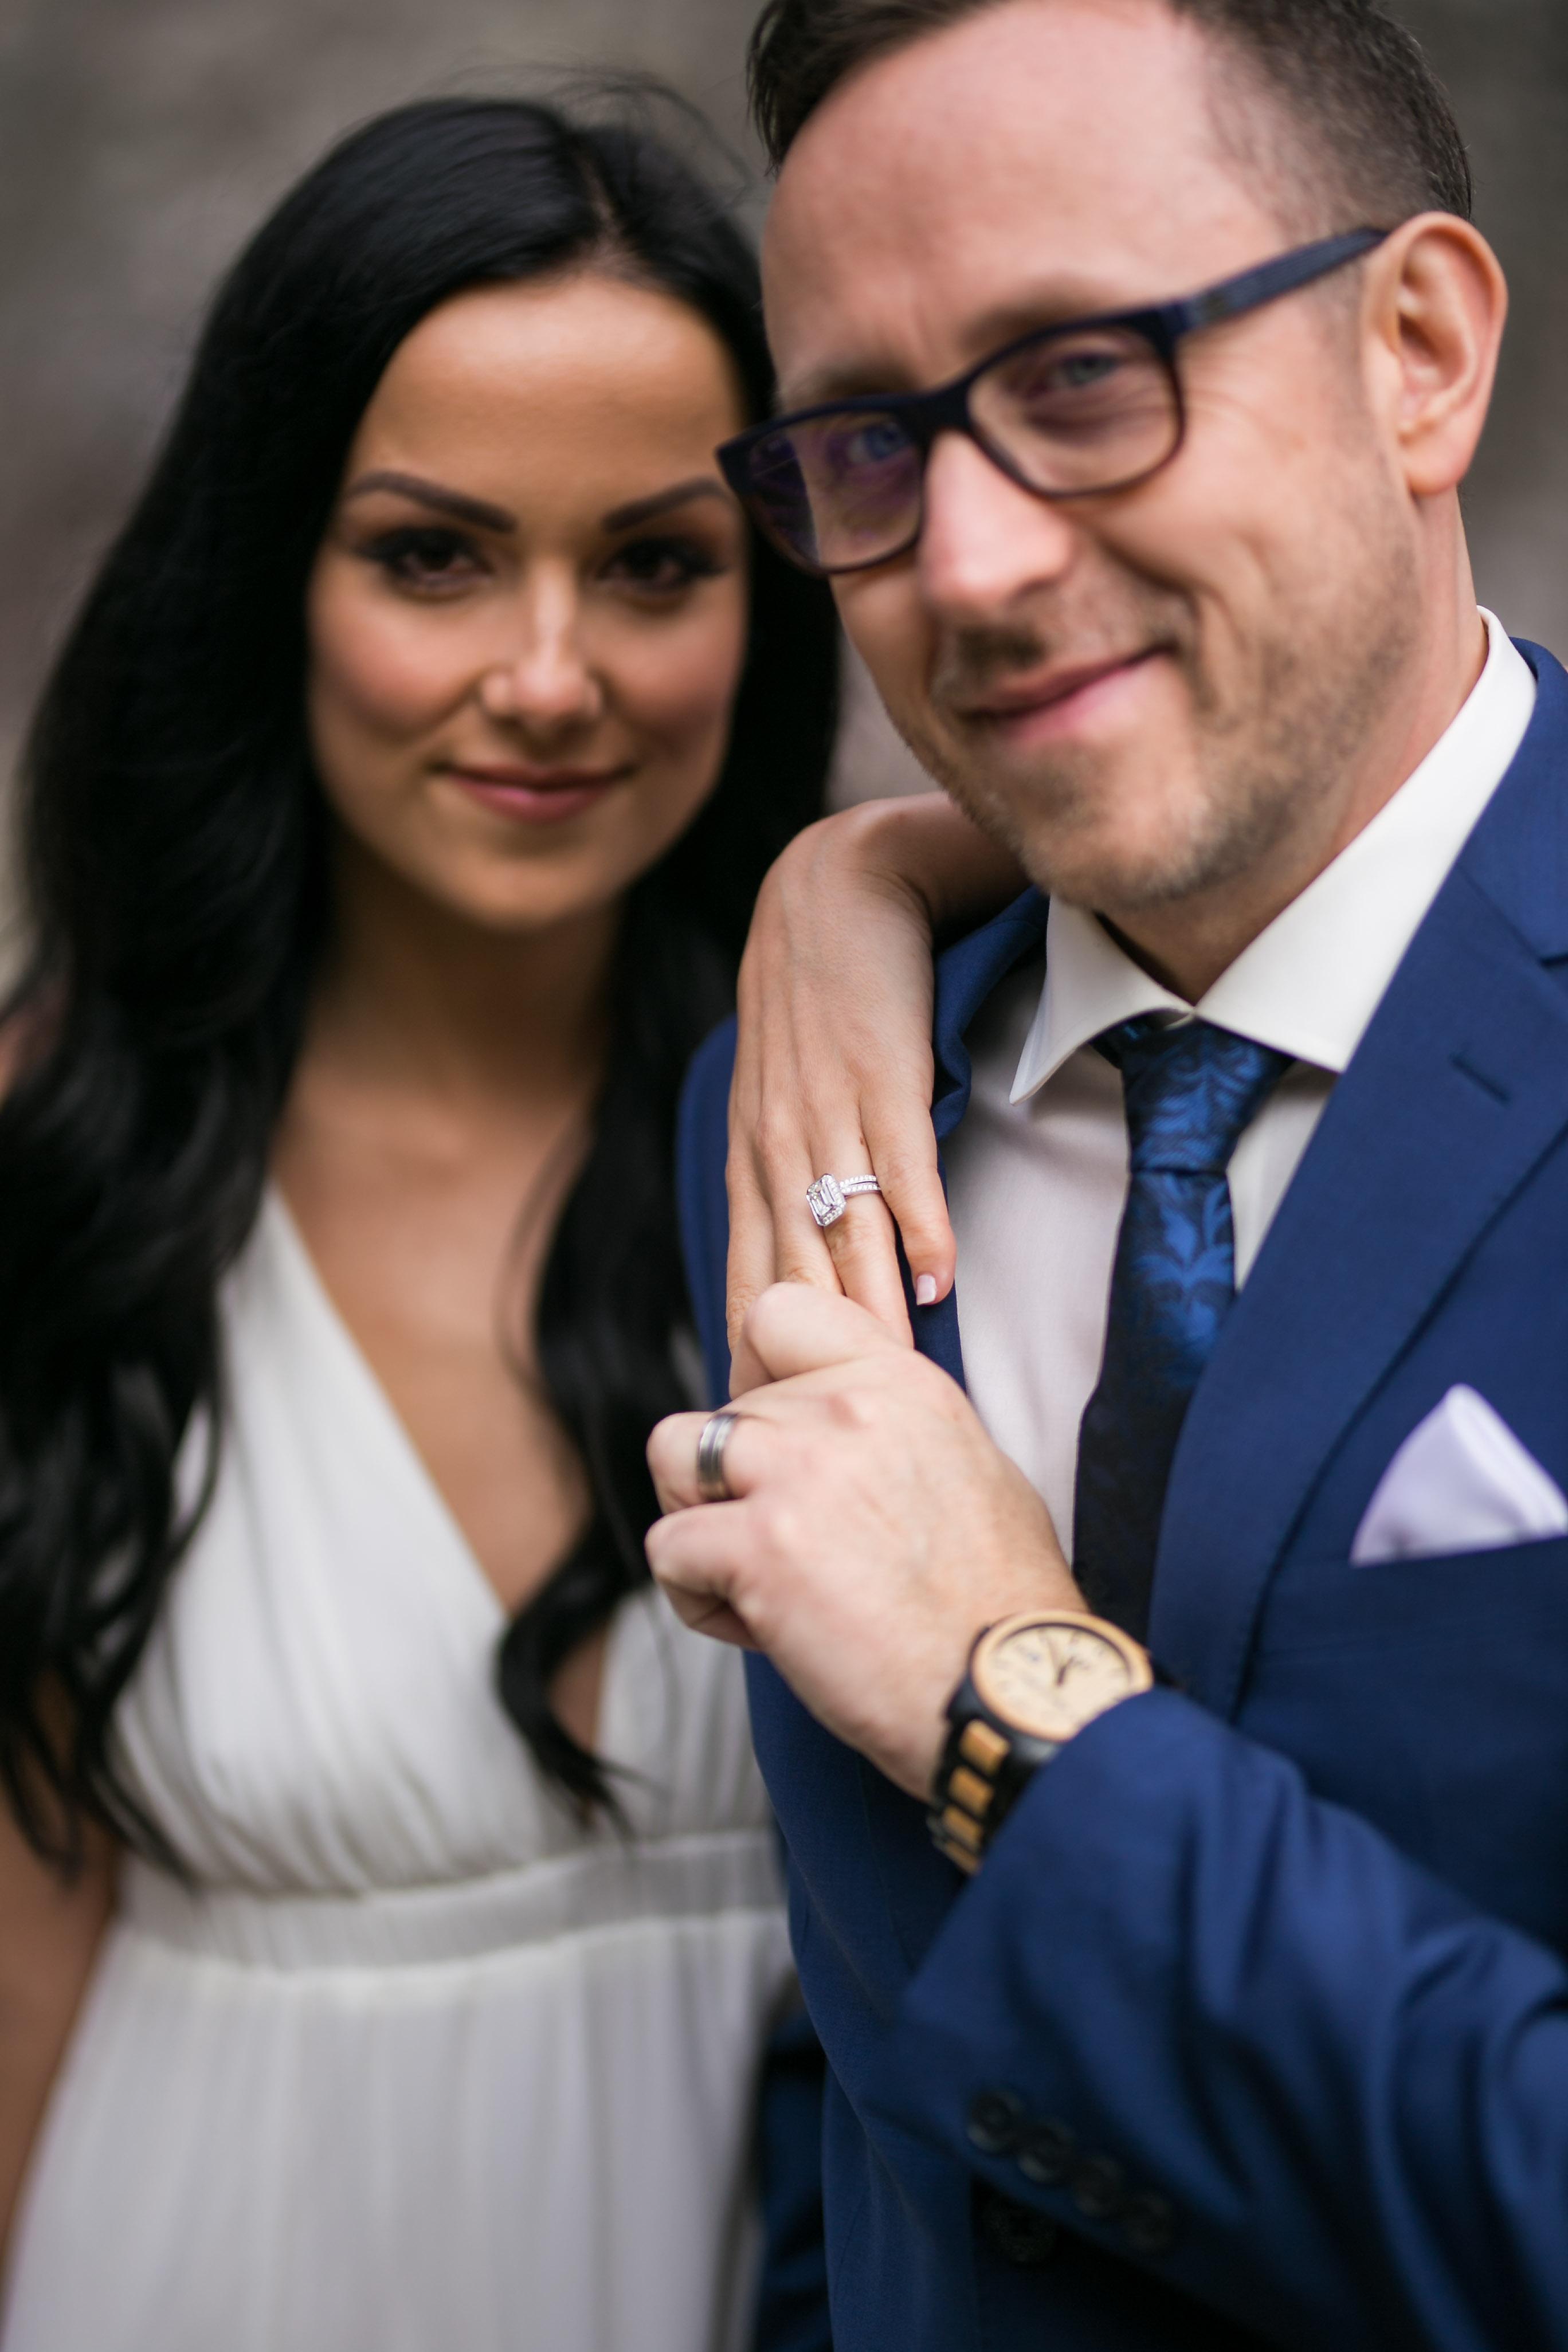 Canadian wedding photographer Clint Bargen Photography